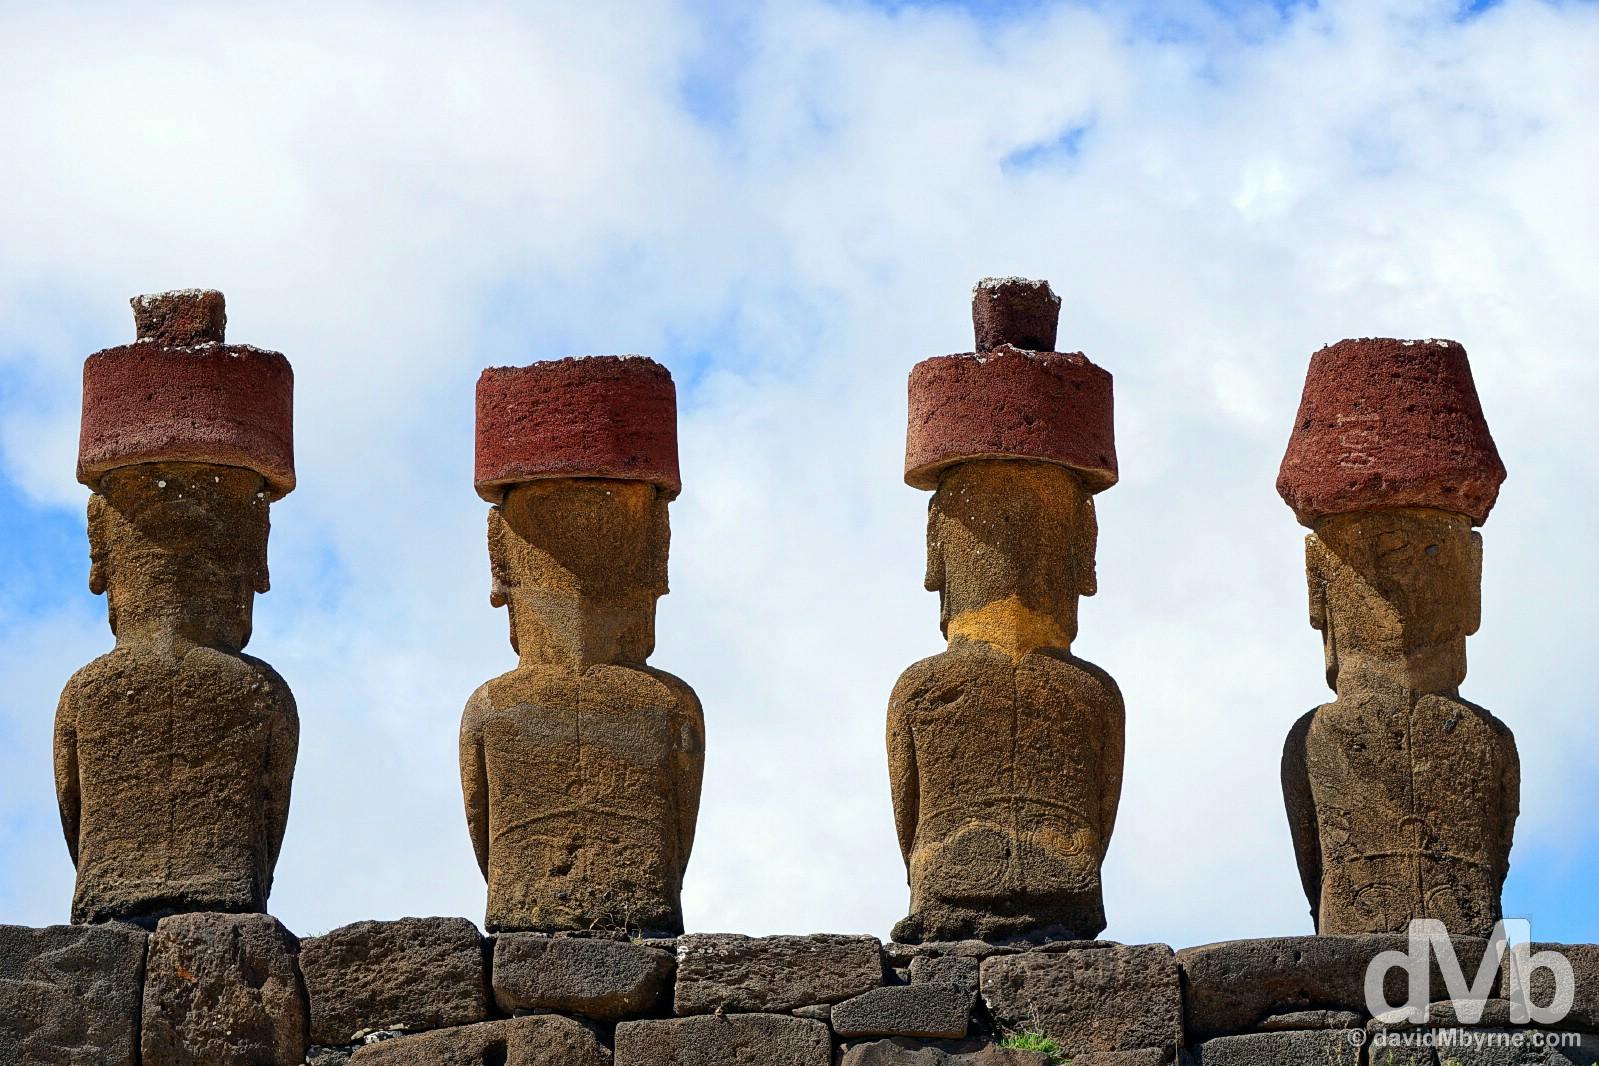 The moai of Ahu Nau Nau, Anakena, Easter Island, Chile. October 1, 2016.